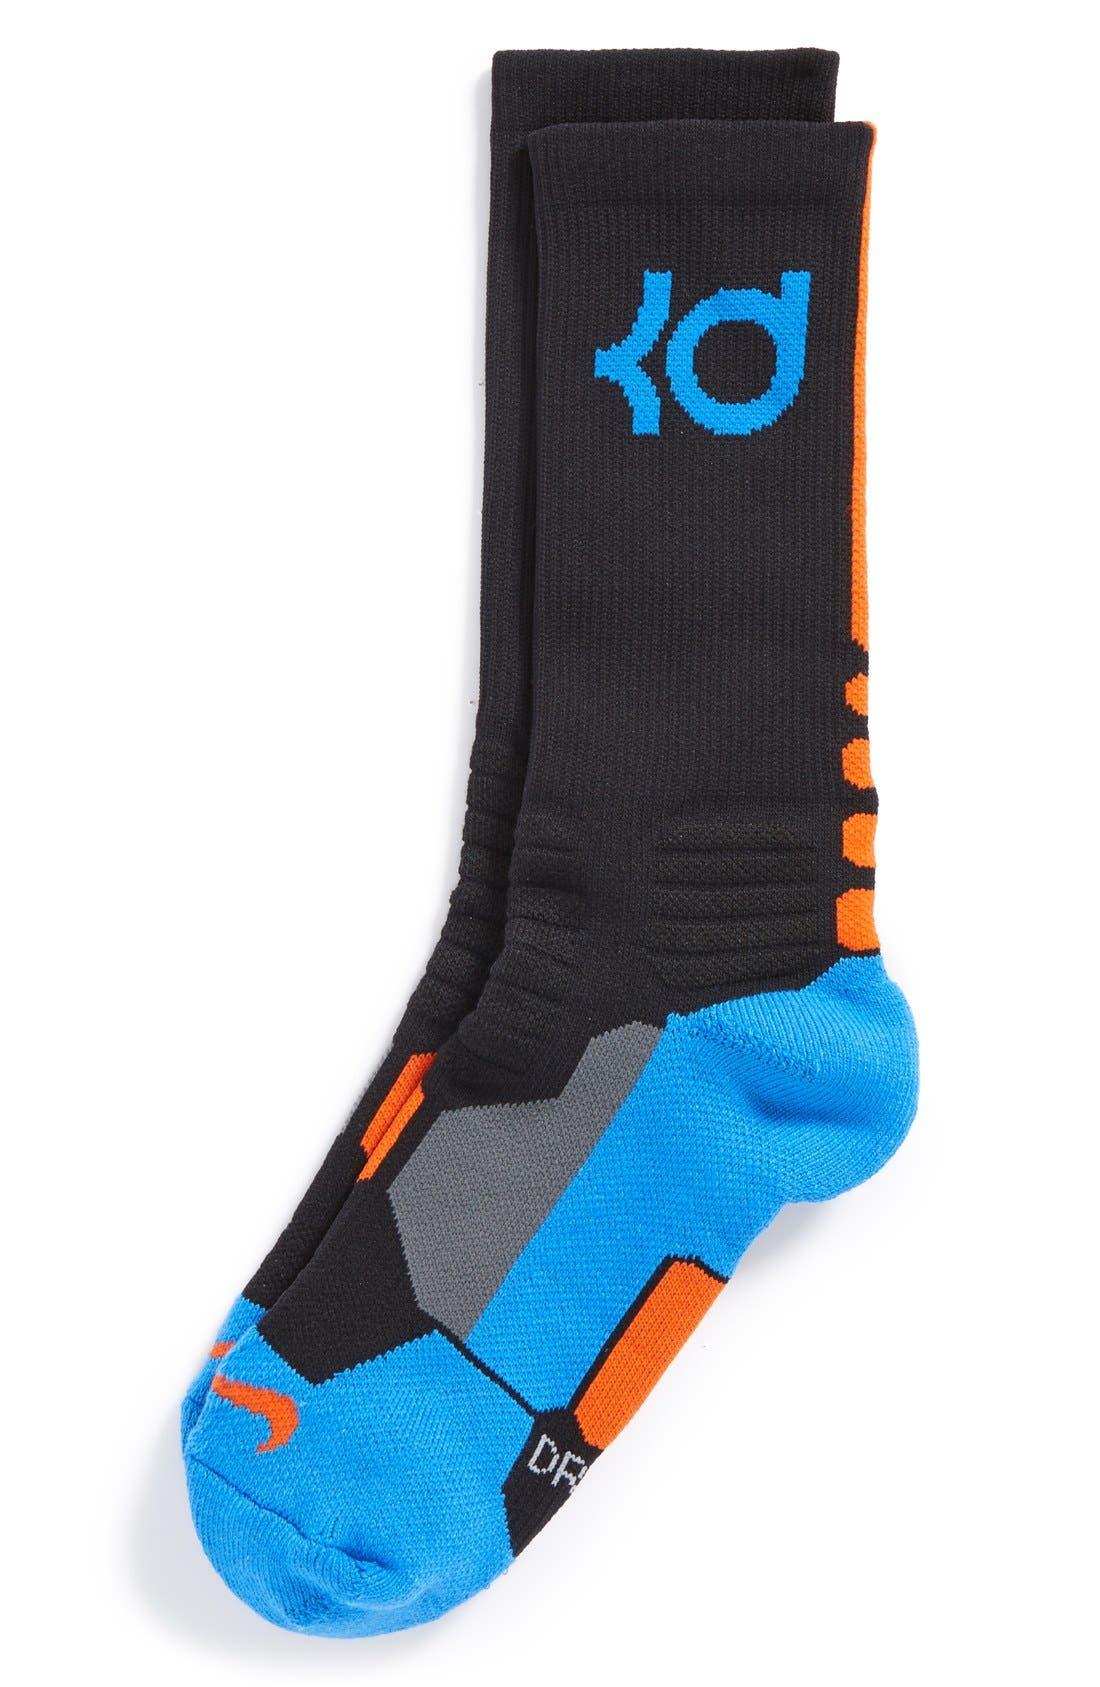 'KD Hyper Elite' Basketball Socks,                             Main thumbnail 1, color,                             008